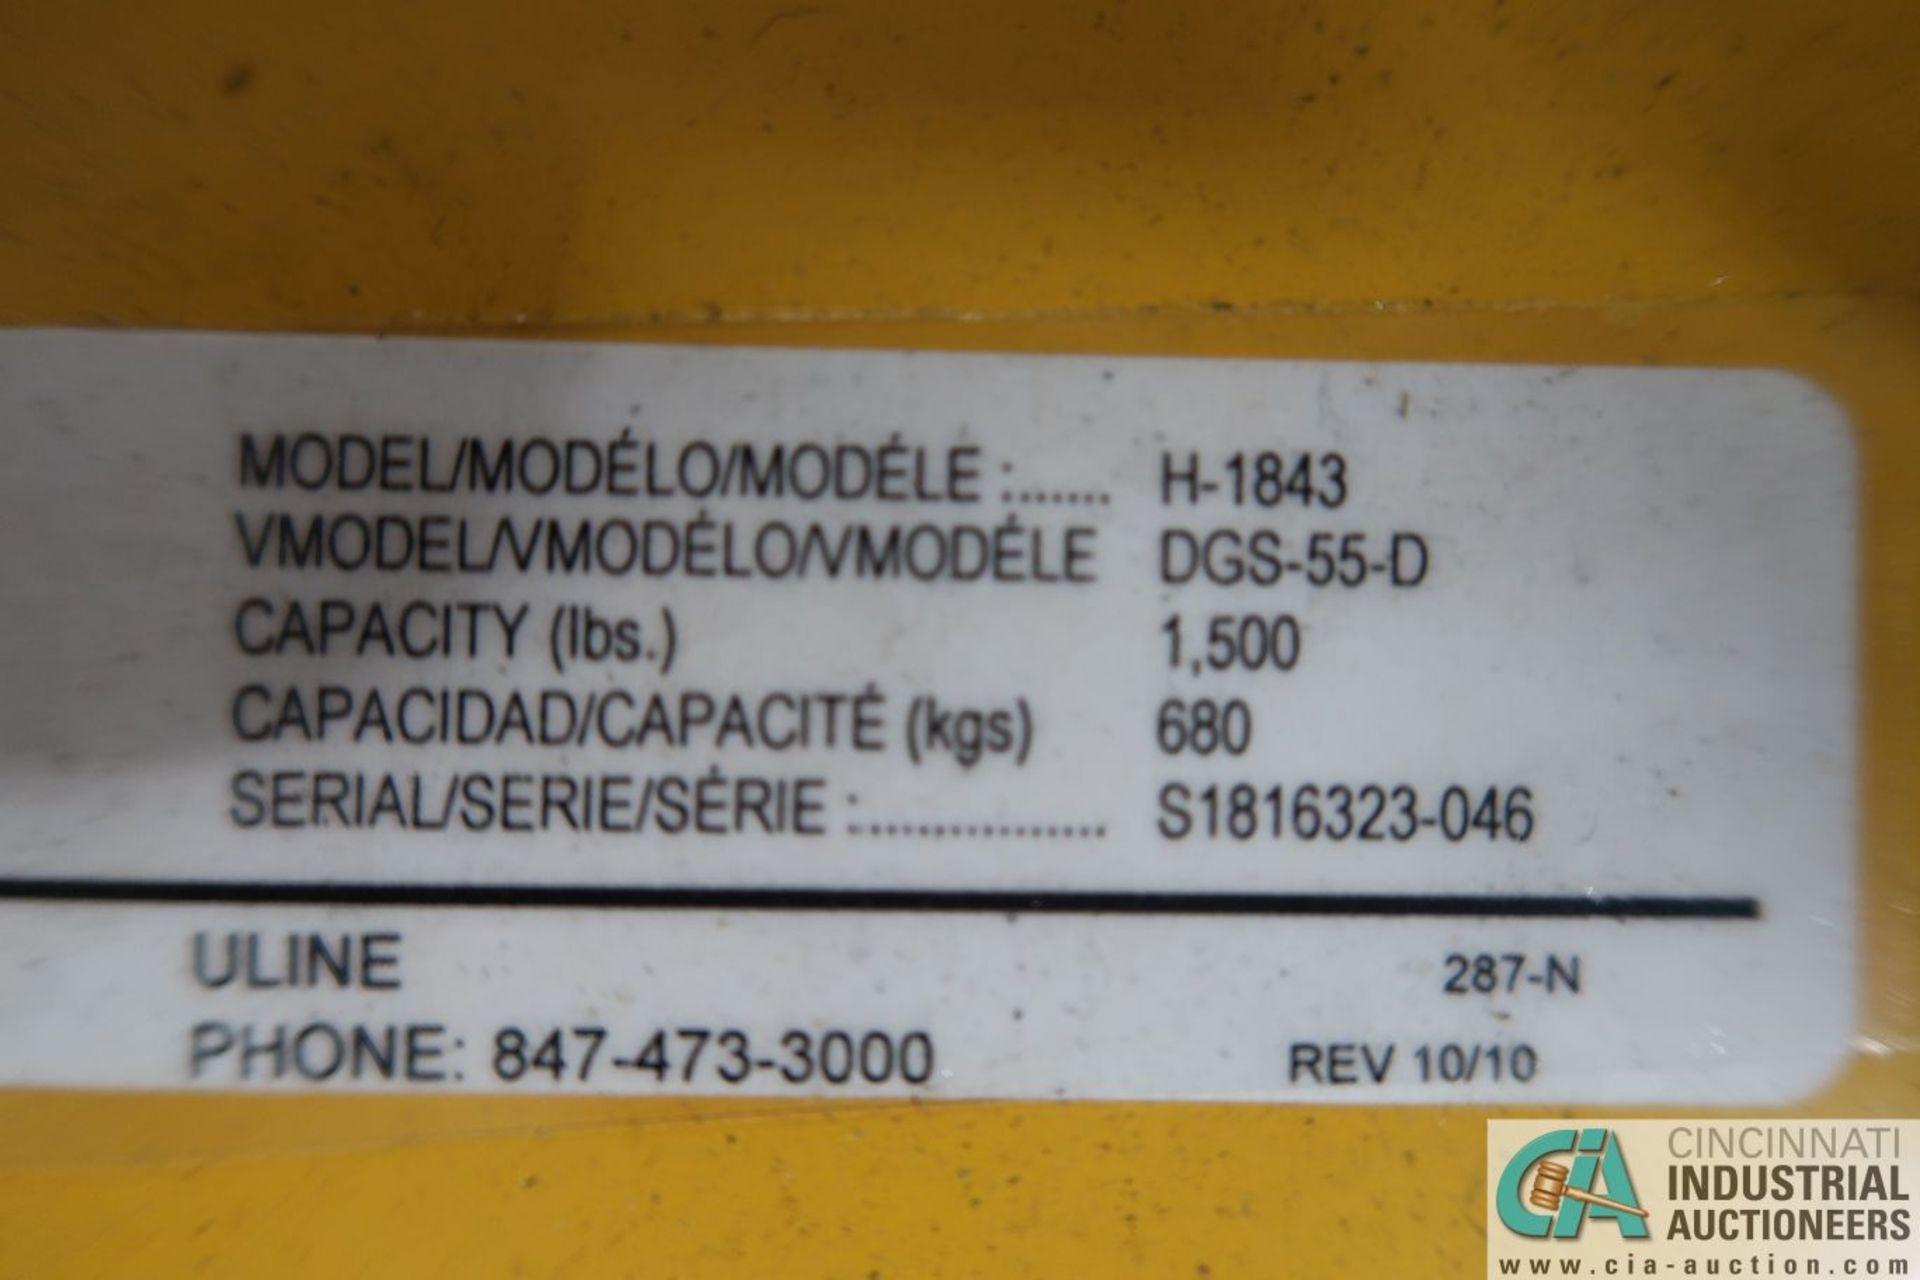 1,500 LB. CAPACITY VESTIL MODEL DGS-55-D LIFT TRUCK DRUM CLAMP - Image 2 of 2